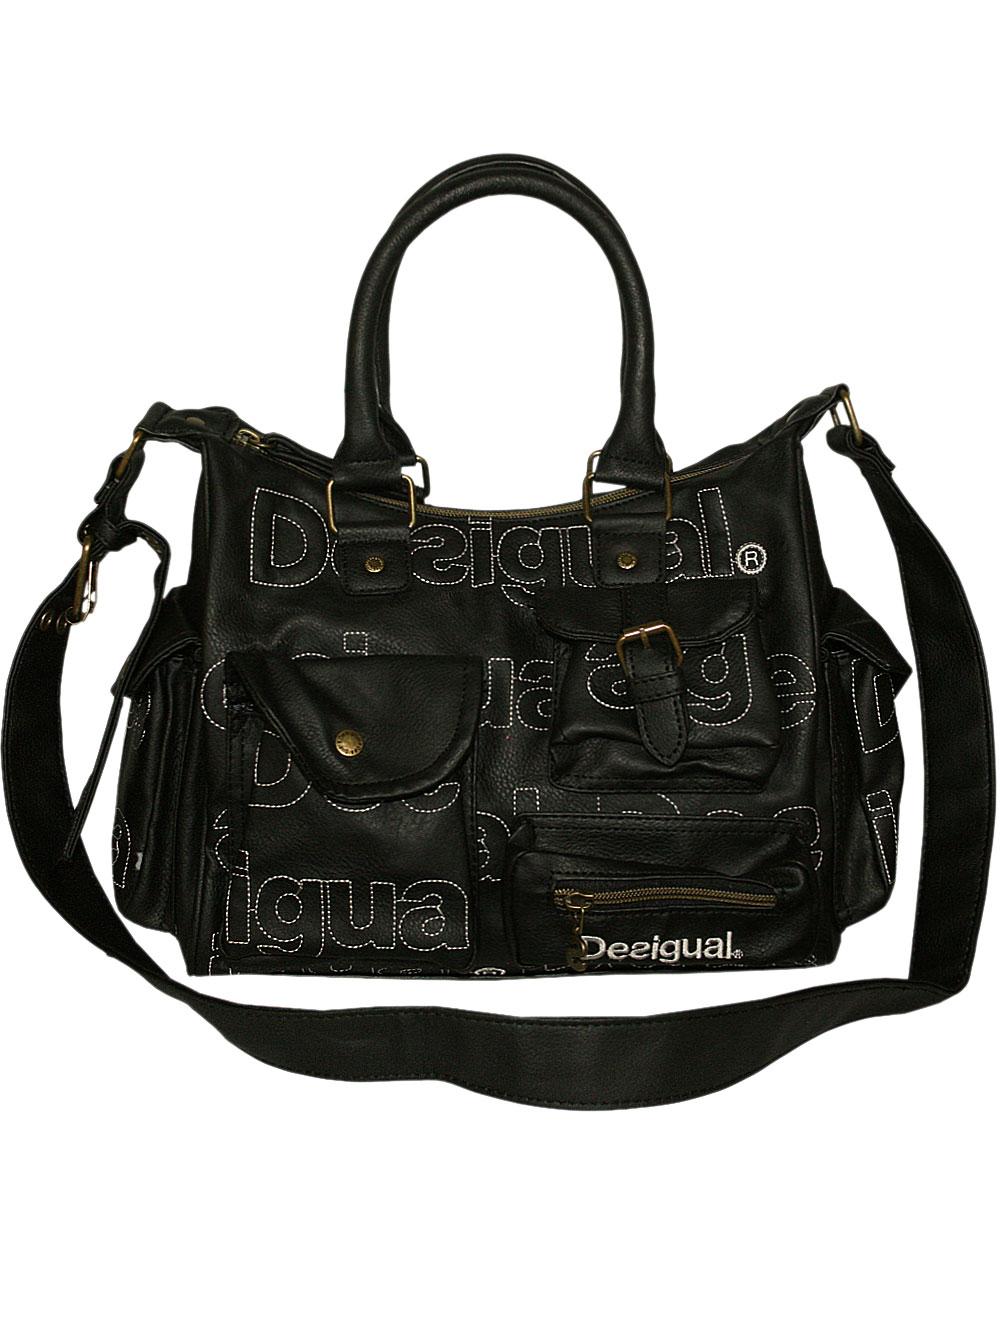 desigual damen handtasche minilondon monogram in negro schwarz neu ovp ebay. Black Bedroom Furniture Sets. Home Design Ideas